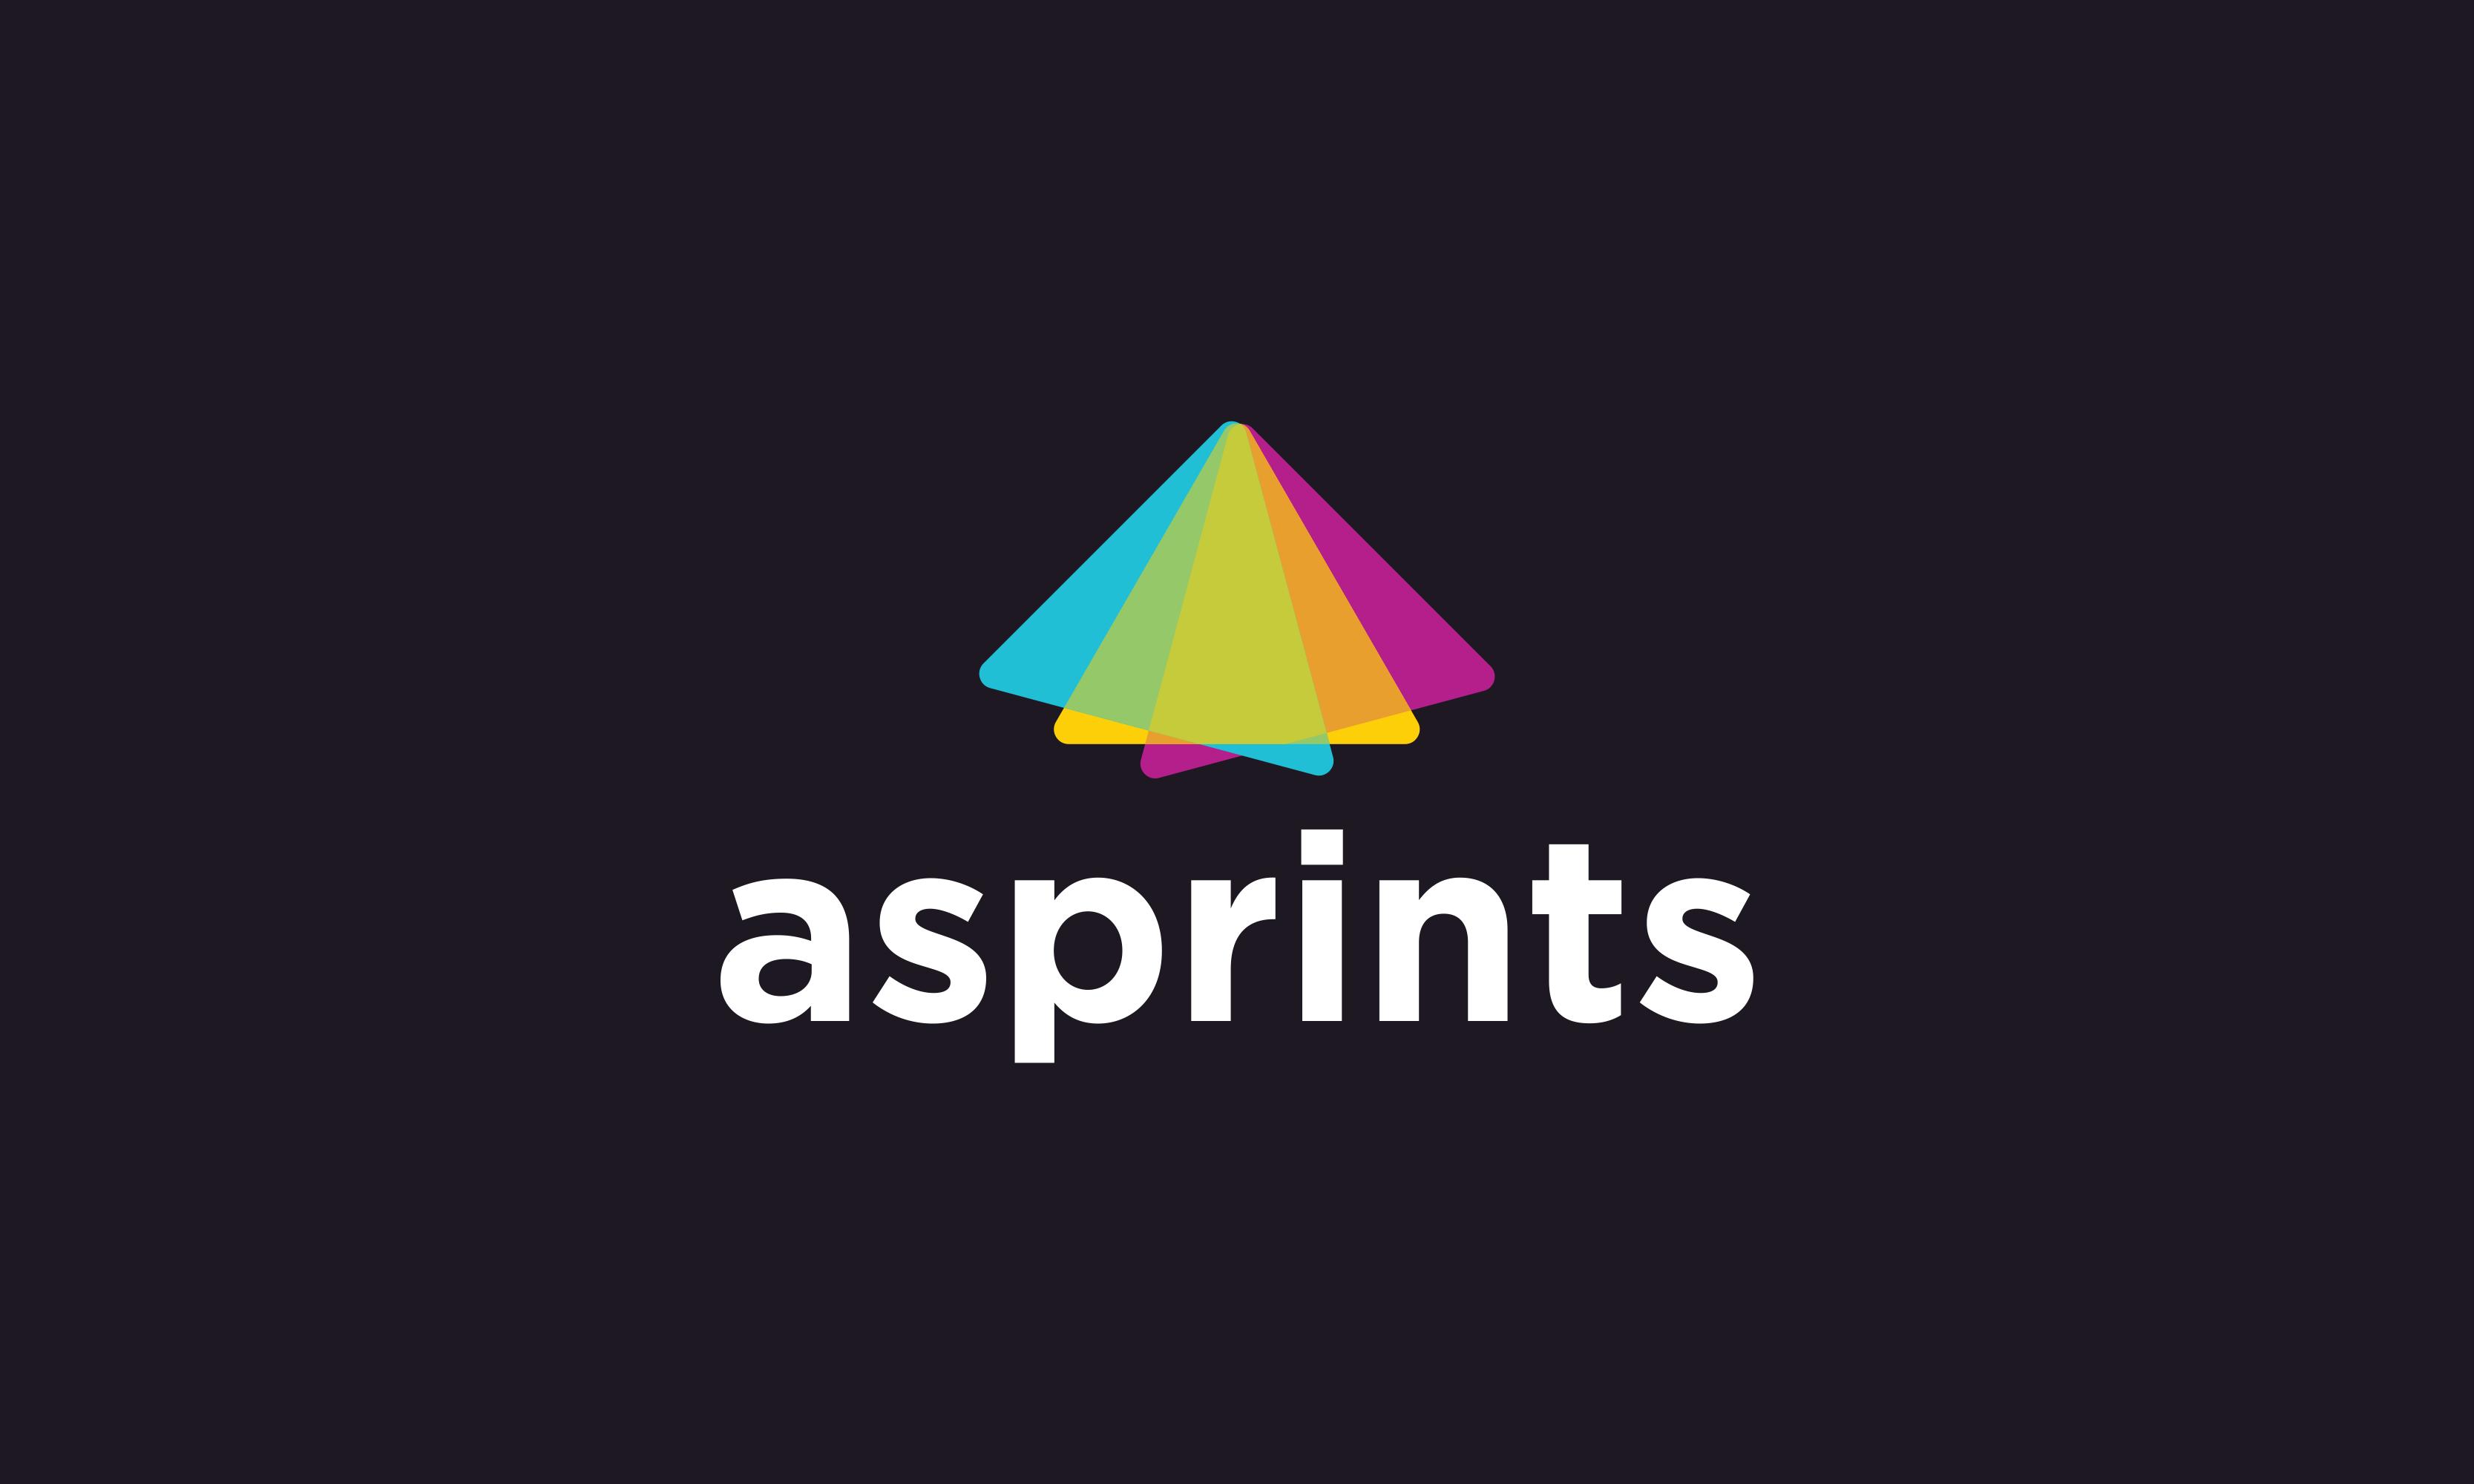 Asprints